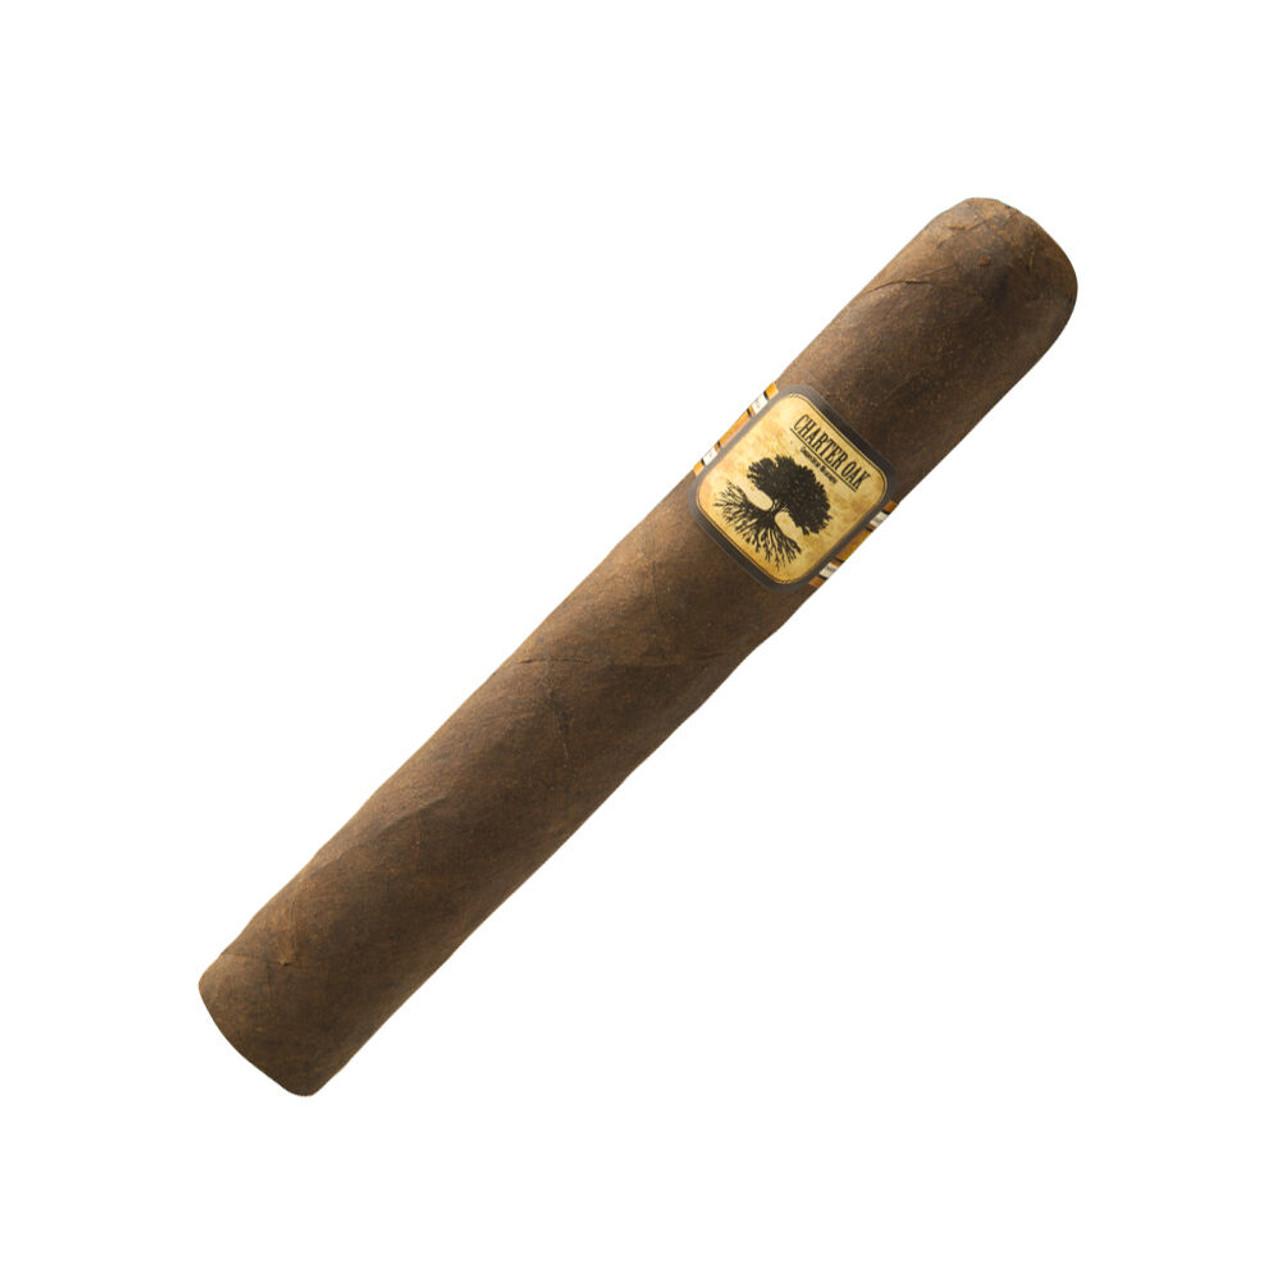 Foundation Charter Oak Grande Maduro Cigars - 6 x 60 (Box of 20)